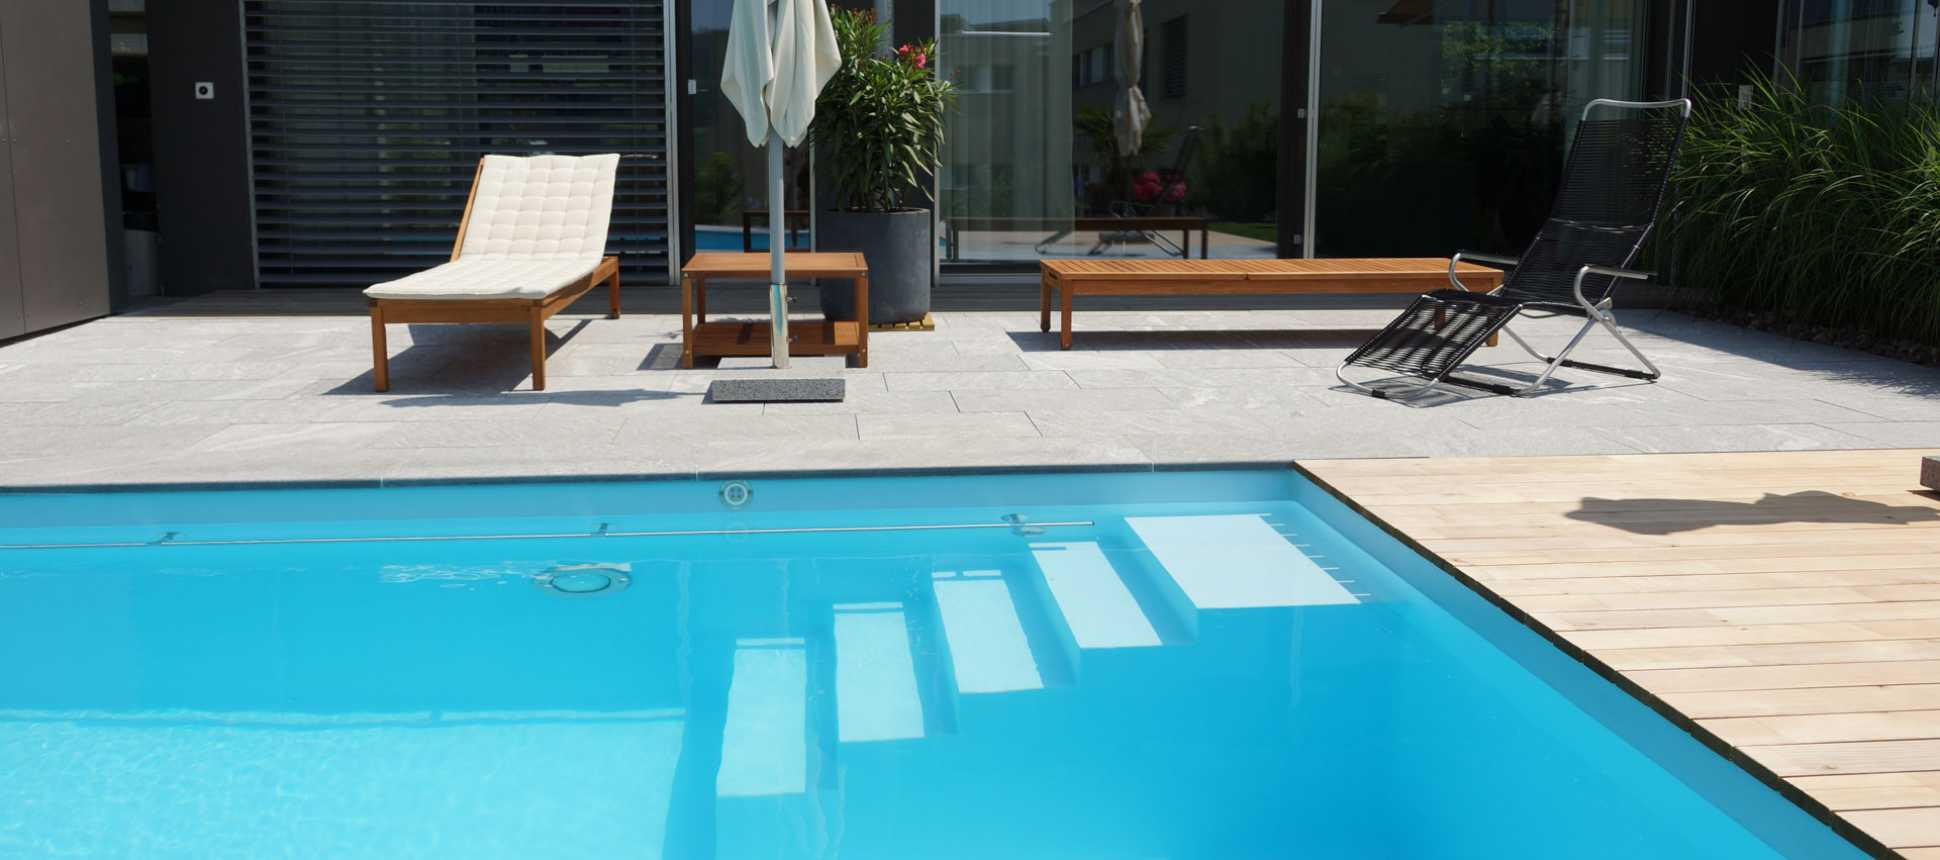 Schwimmbadsanierung Holz Swimming Pool Holzpool